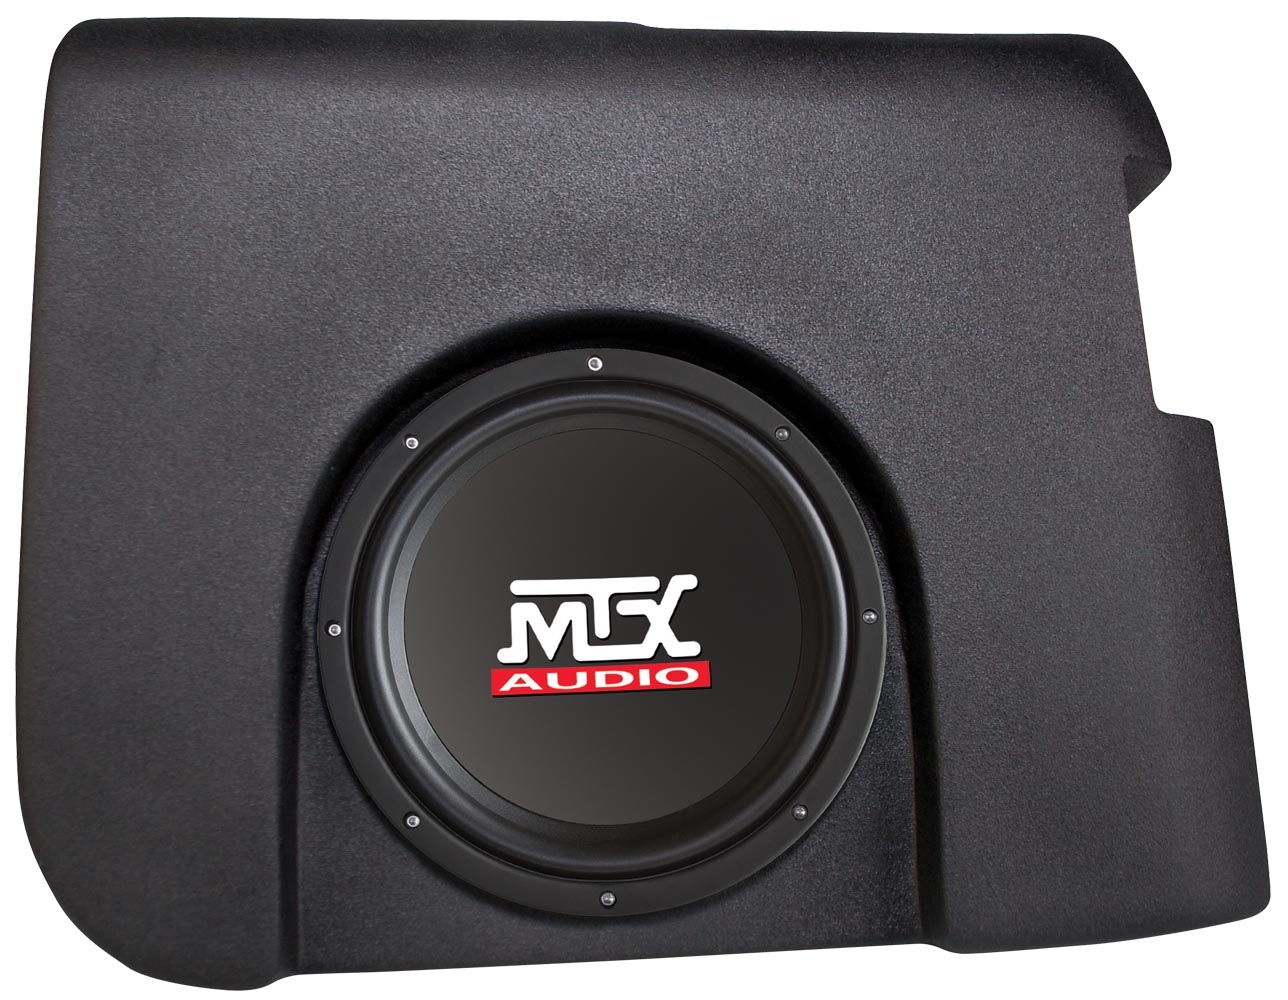 Mtx Audio Vehicle Specific Custom Subwoofer Enclosure For 2008